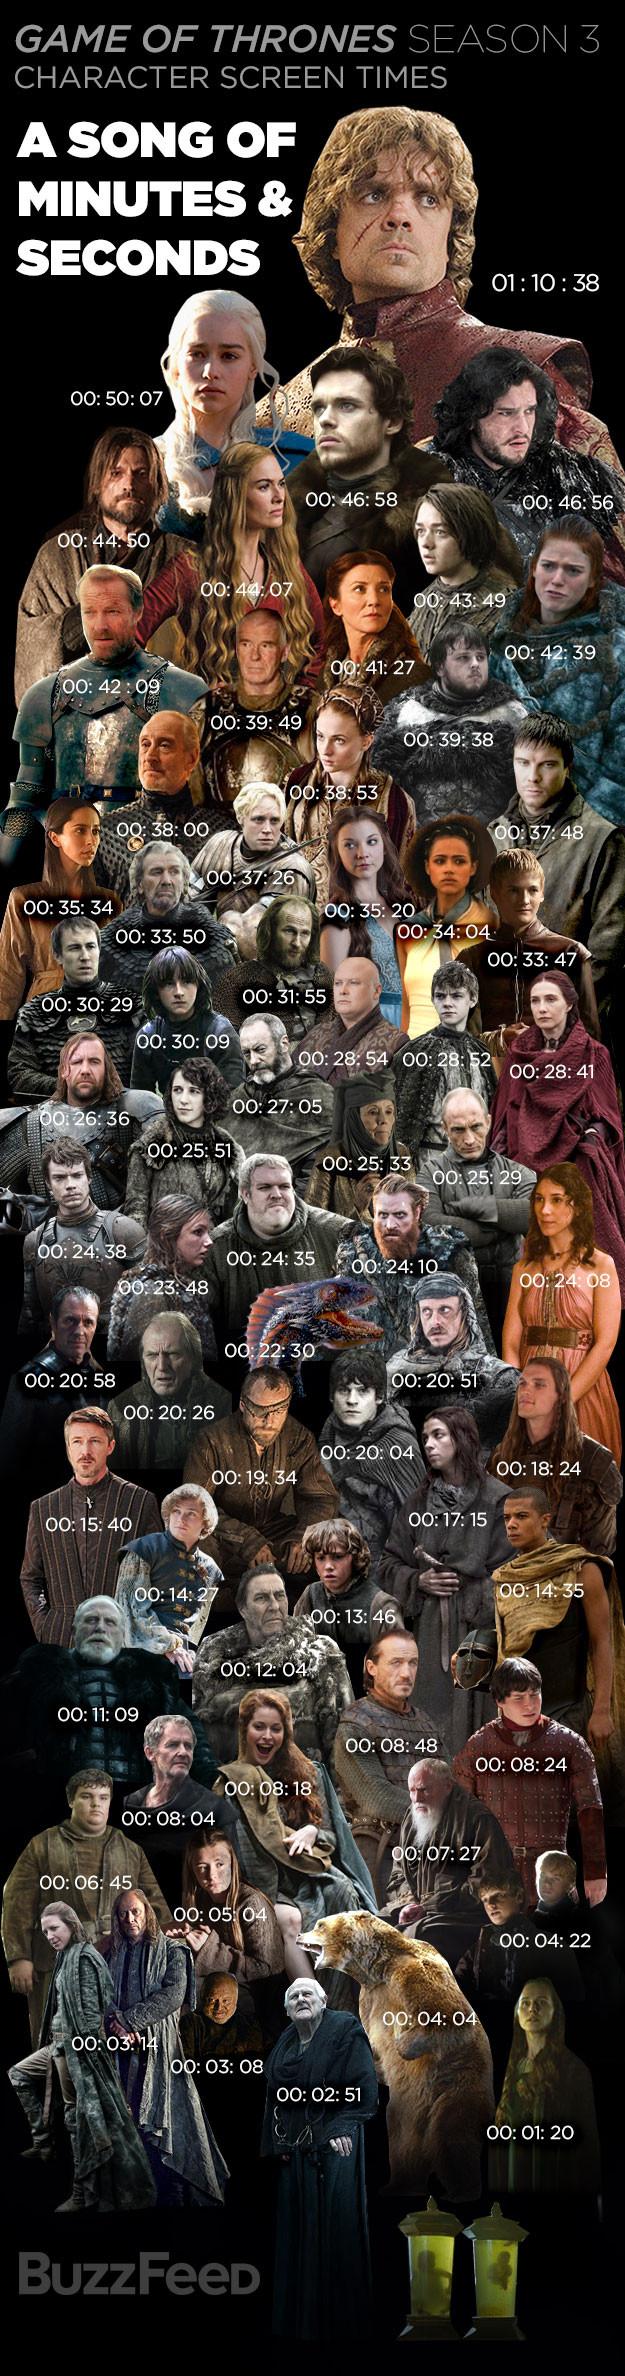 Thrones-S3-screentime.jpg